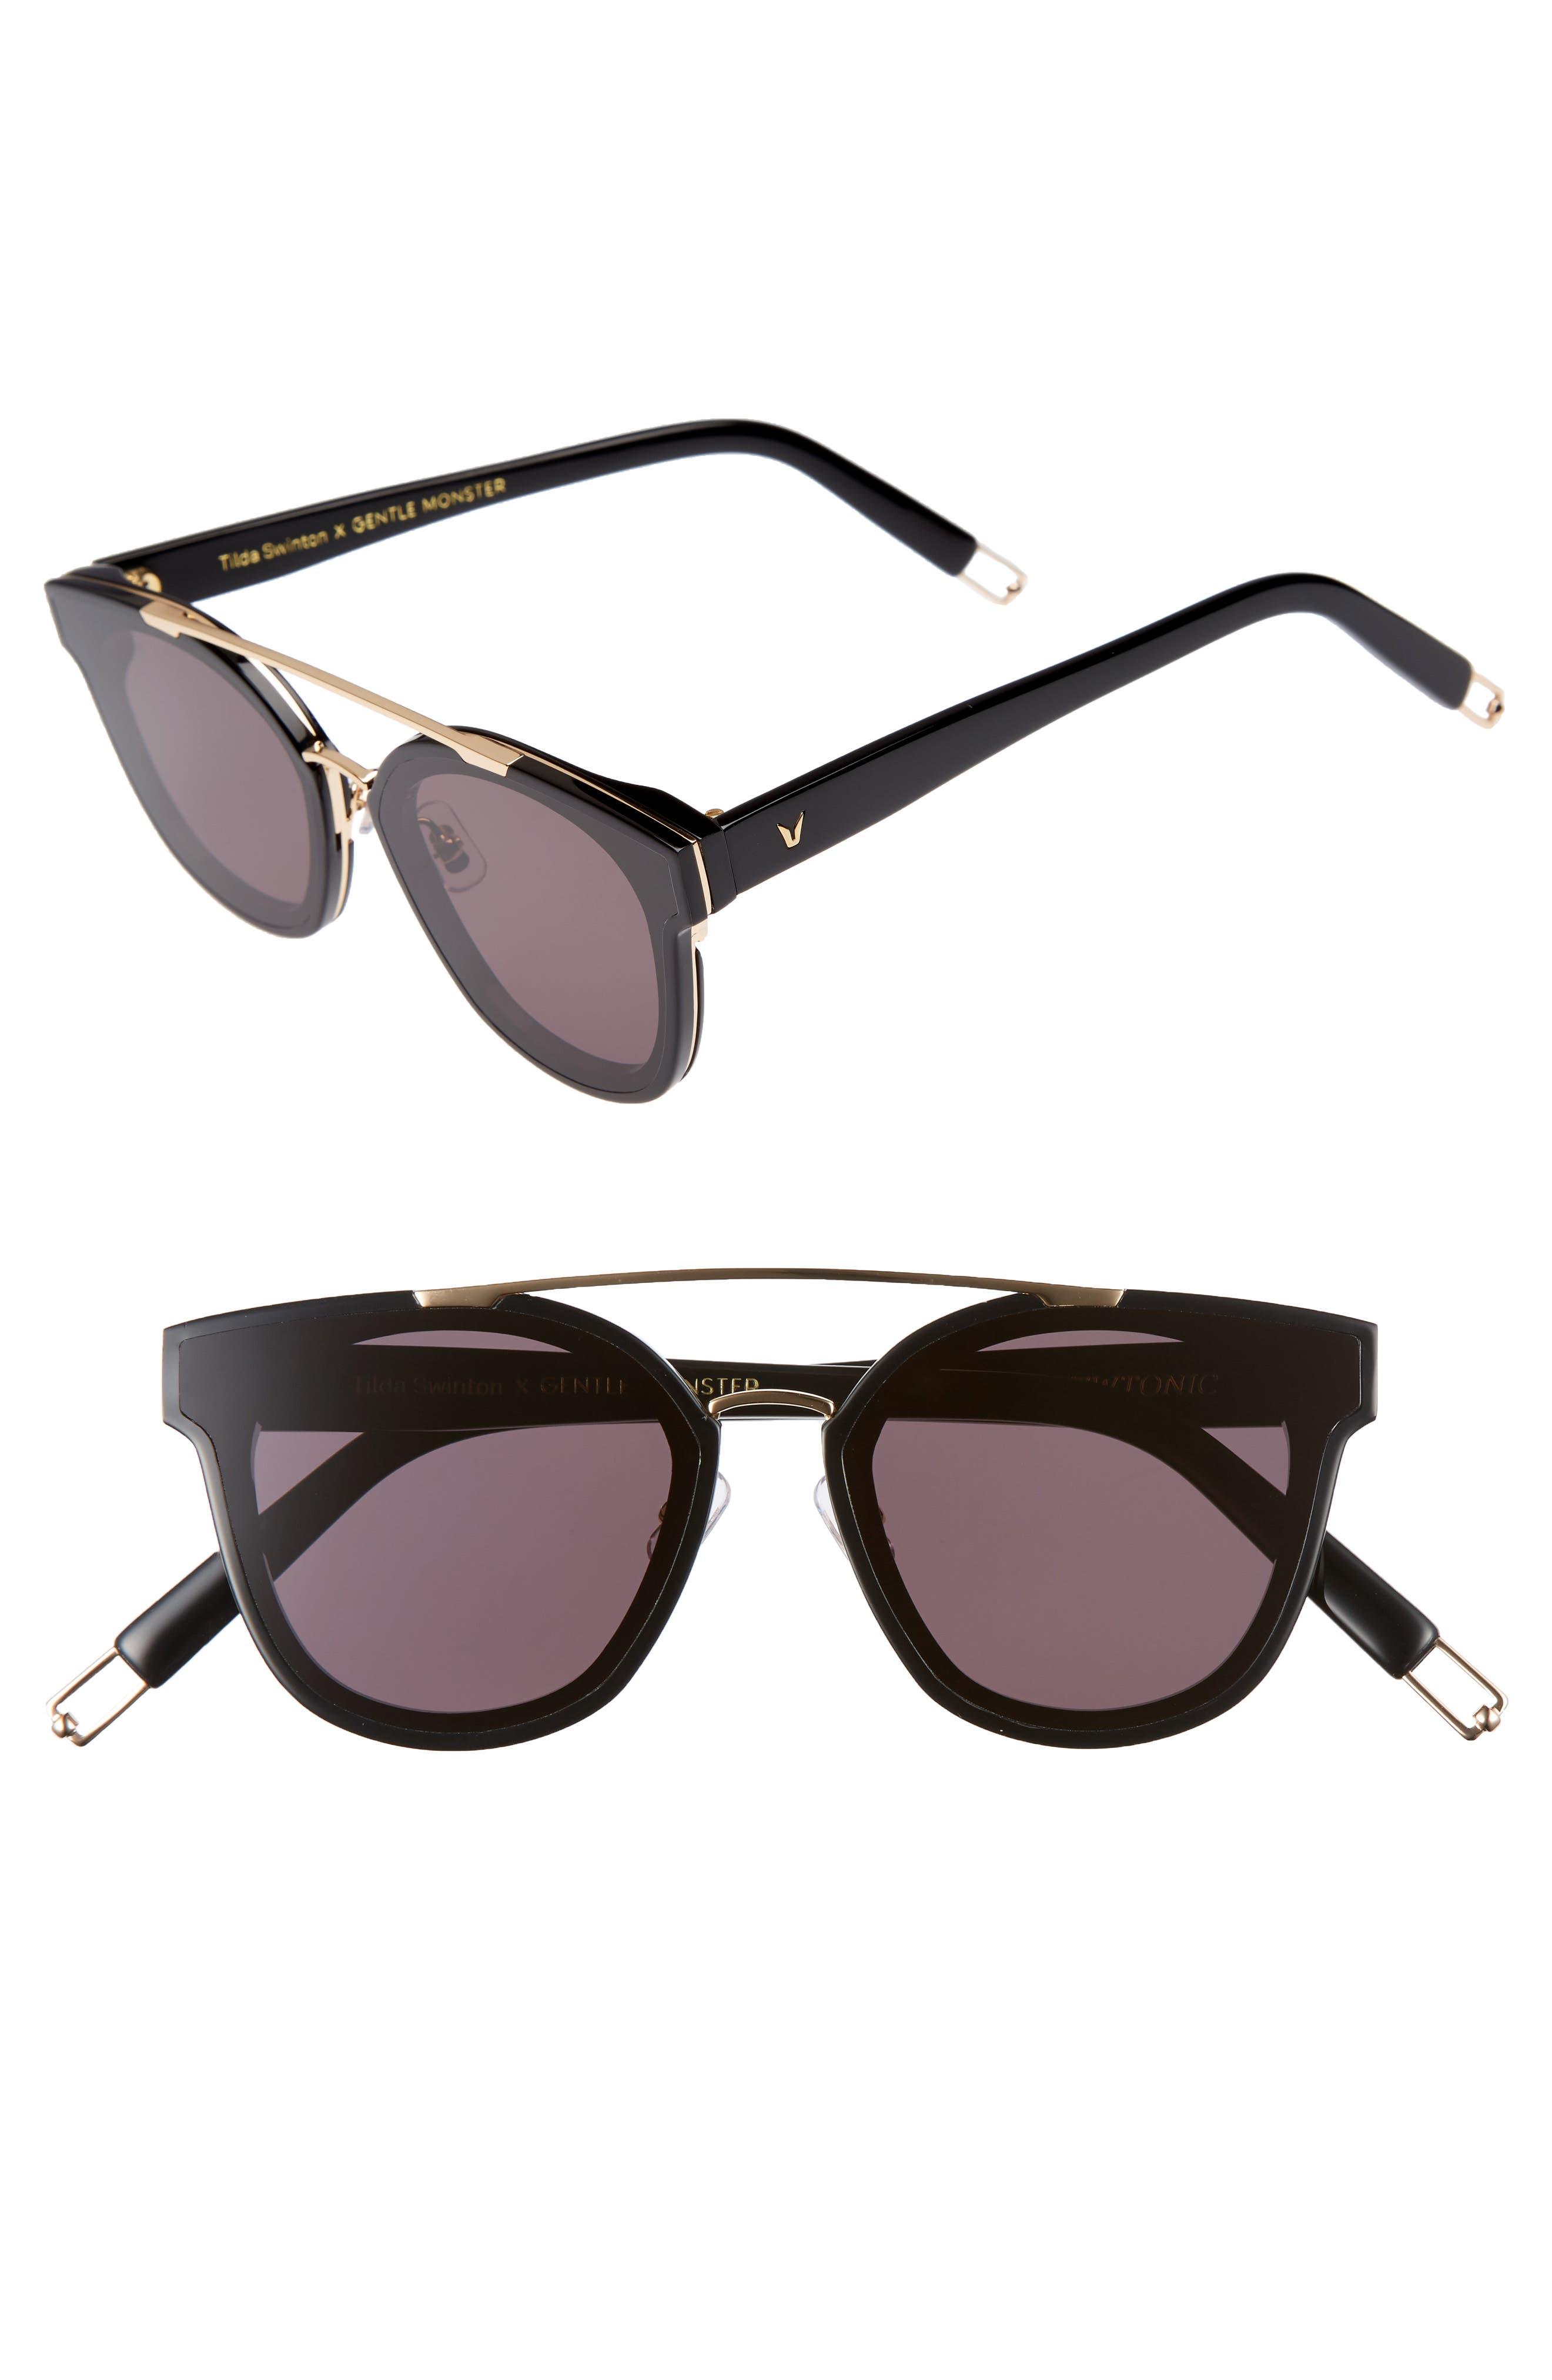 Tilda Swinton x Gentle Monster Newtonic 60mm Rounded Sunglasses,                         Main,                         color,